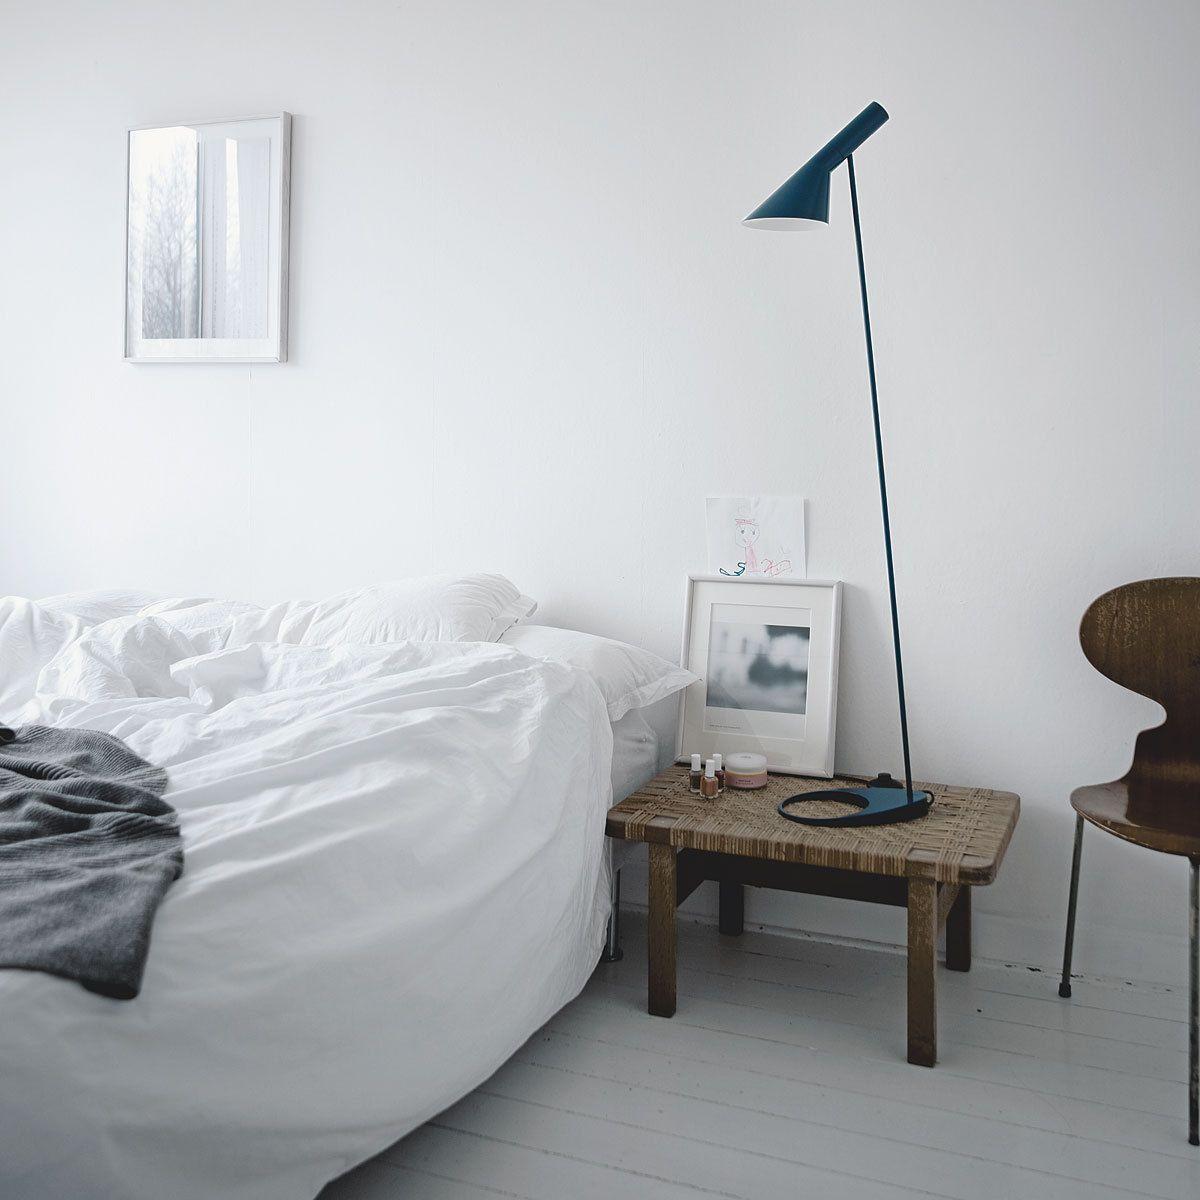 Arne jacobsen interior stehlampe aj   interior  pinterest  interiors and lights